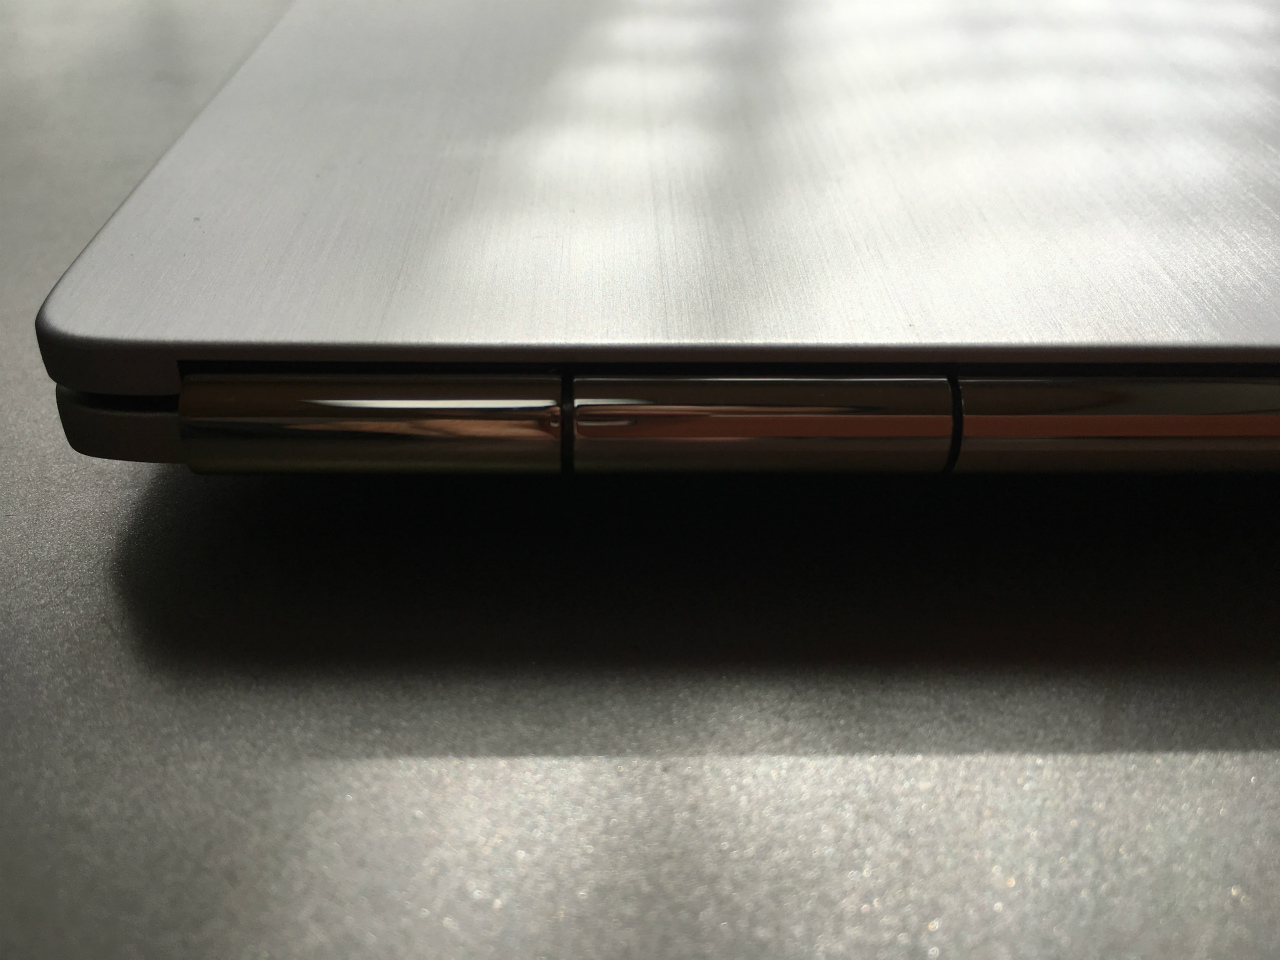 hp-chromebook-13-g1-018